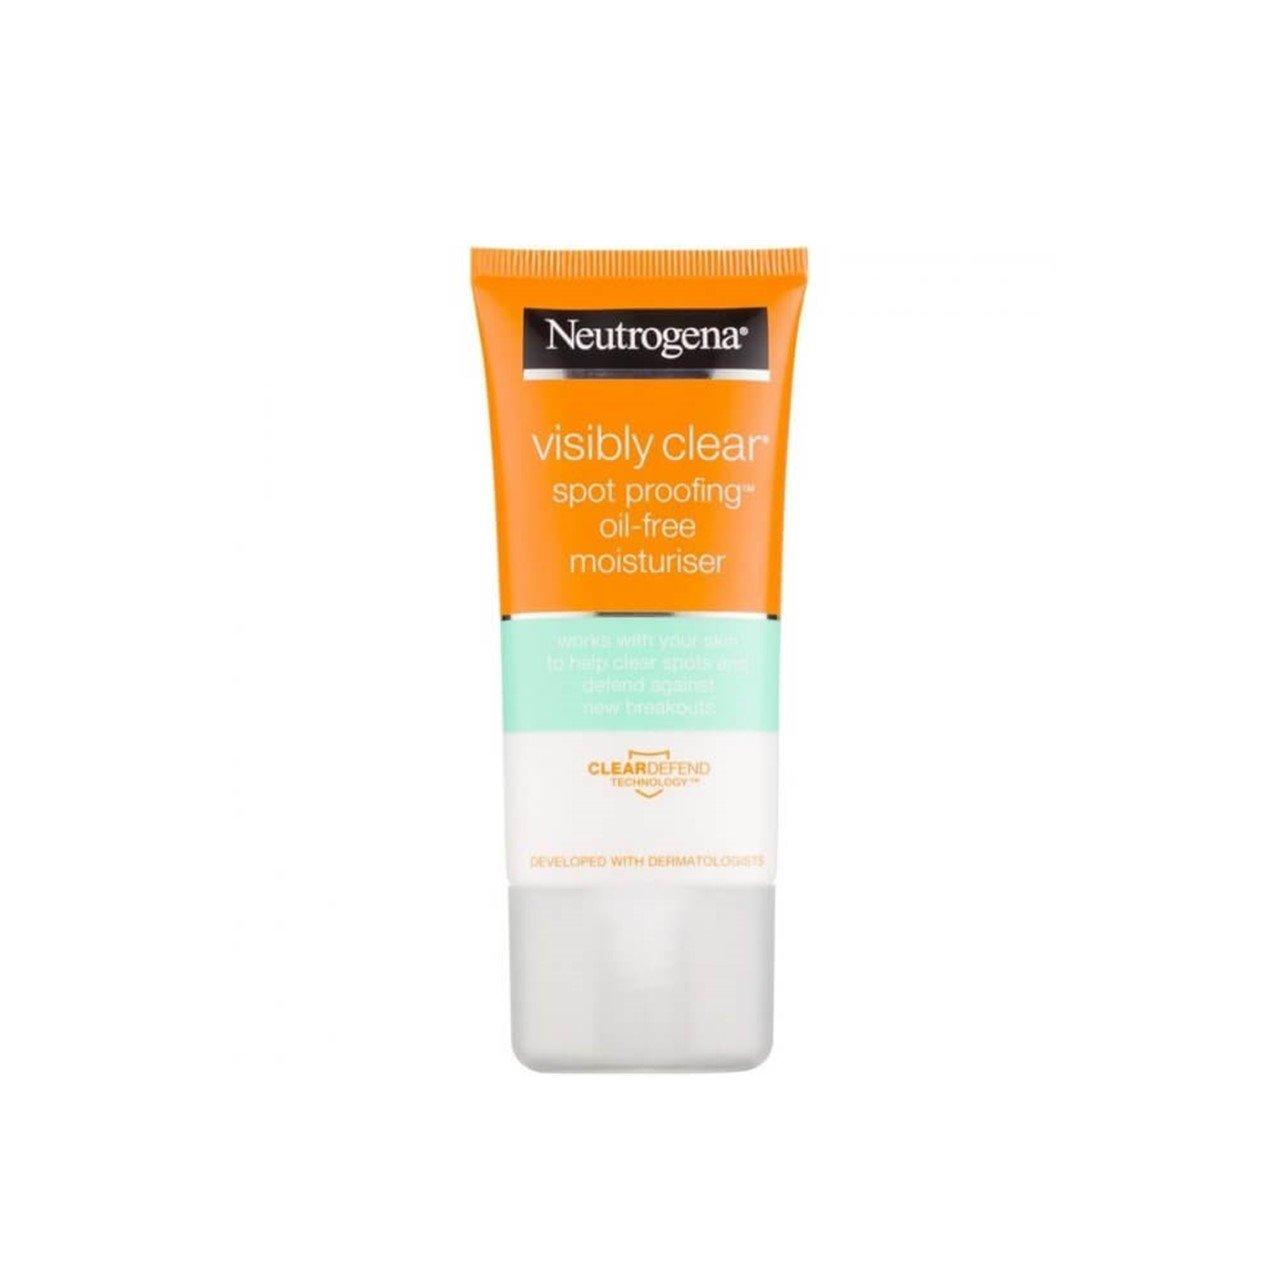 neutrogena visibly clear oil free moisturiser 50ml